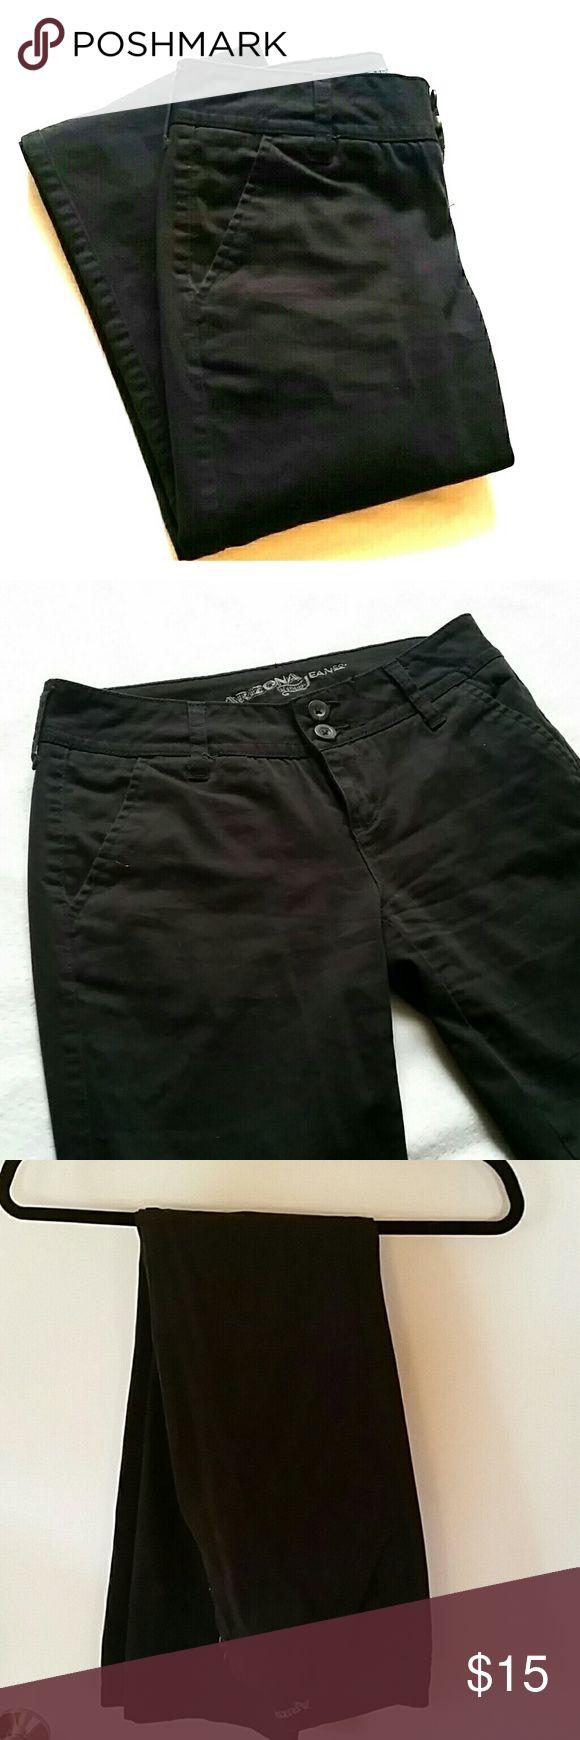 Arizona black khaki pants Black arizona khakis, size 1 Long. Boot cut, slim fit. Like new, only worn a few times. Bundle these with the khaki pair for only  $16! Arizona  Pants Boot Cut & Flare